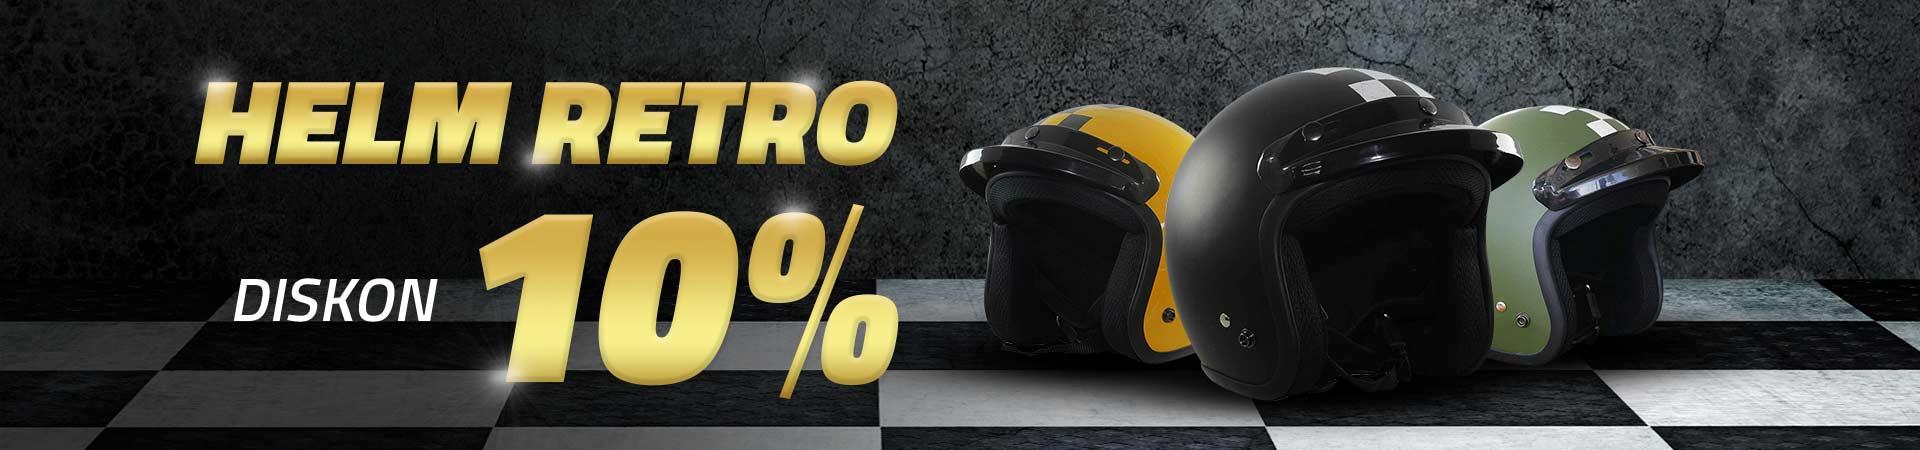 Diskon 10% Helm Retro